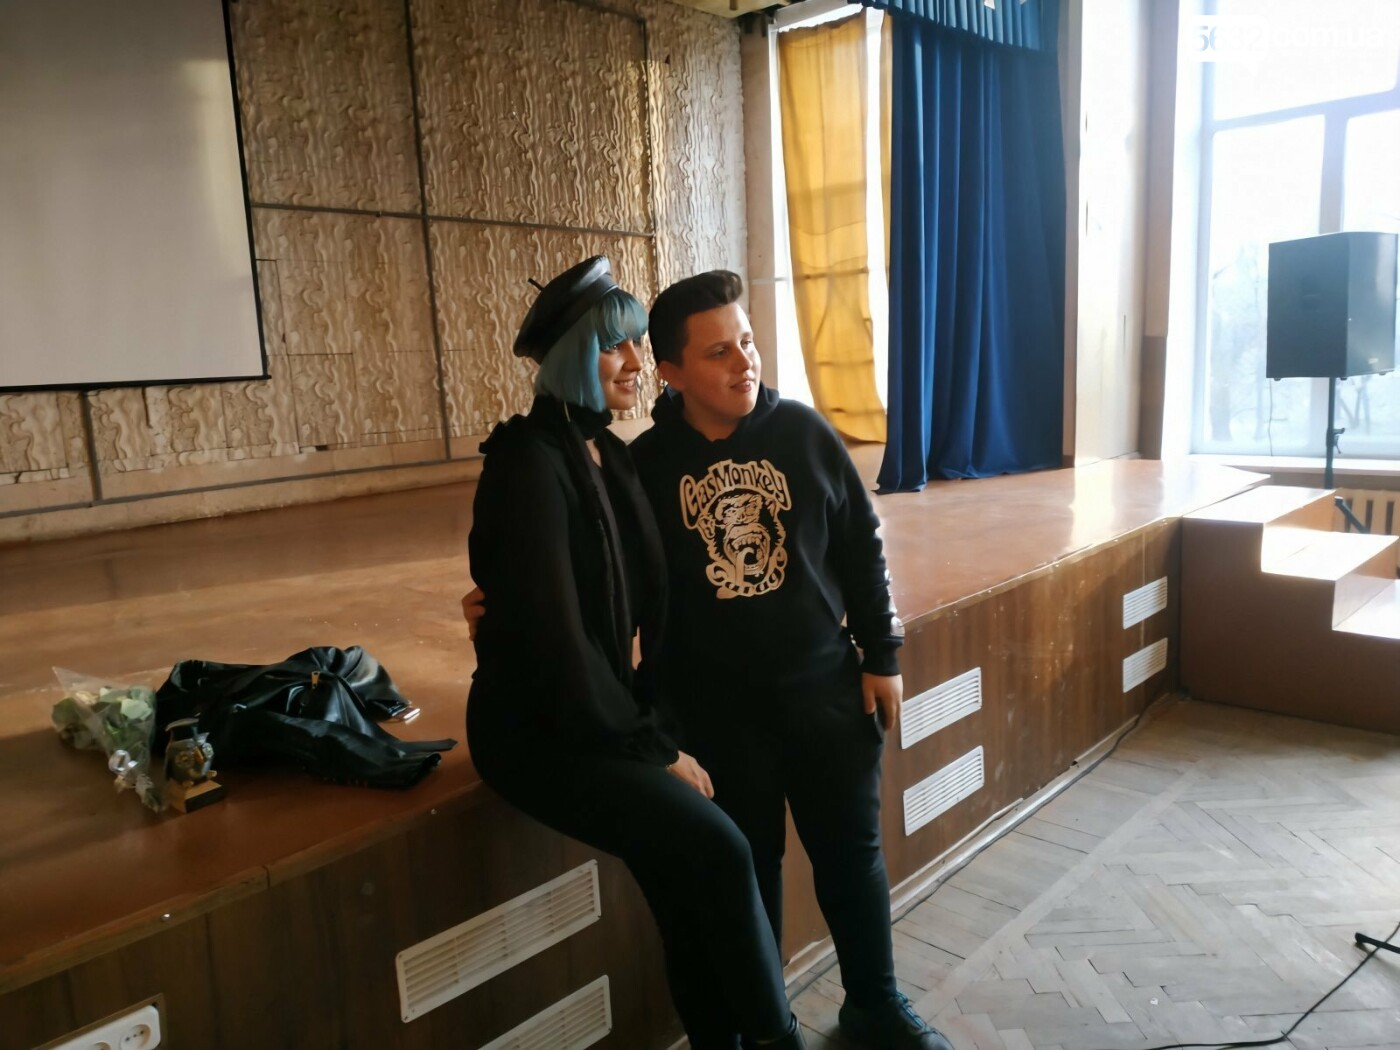 В Павлоград приехала наша популярная землячка – певица MARUV, фото-2